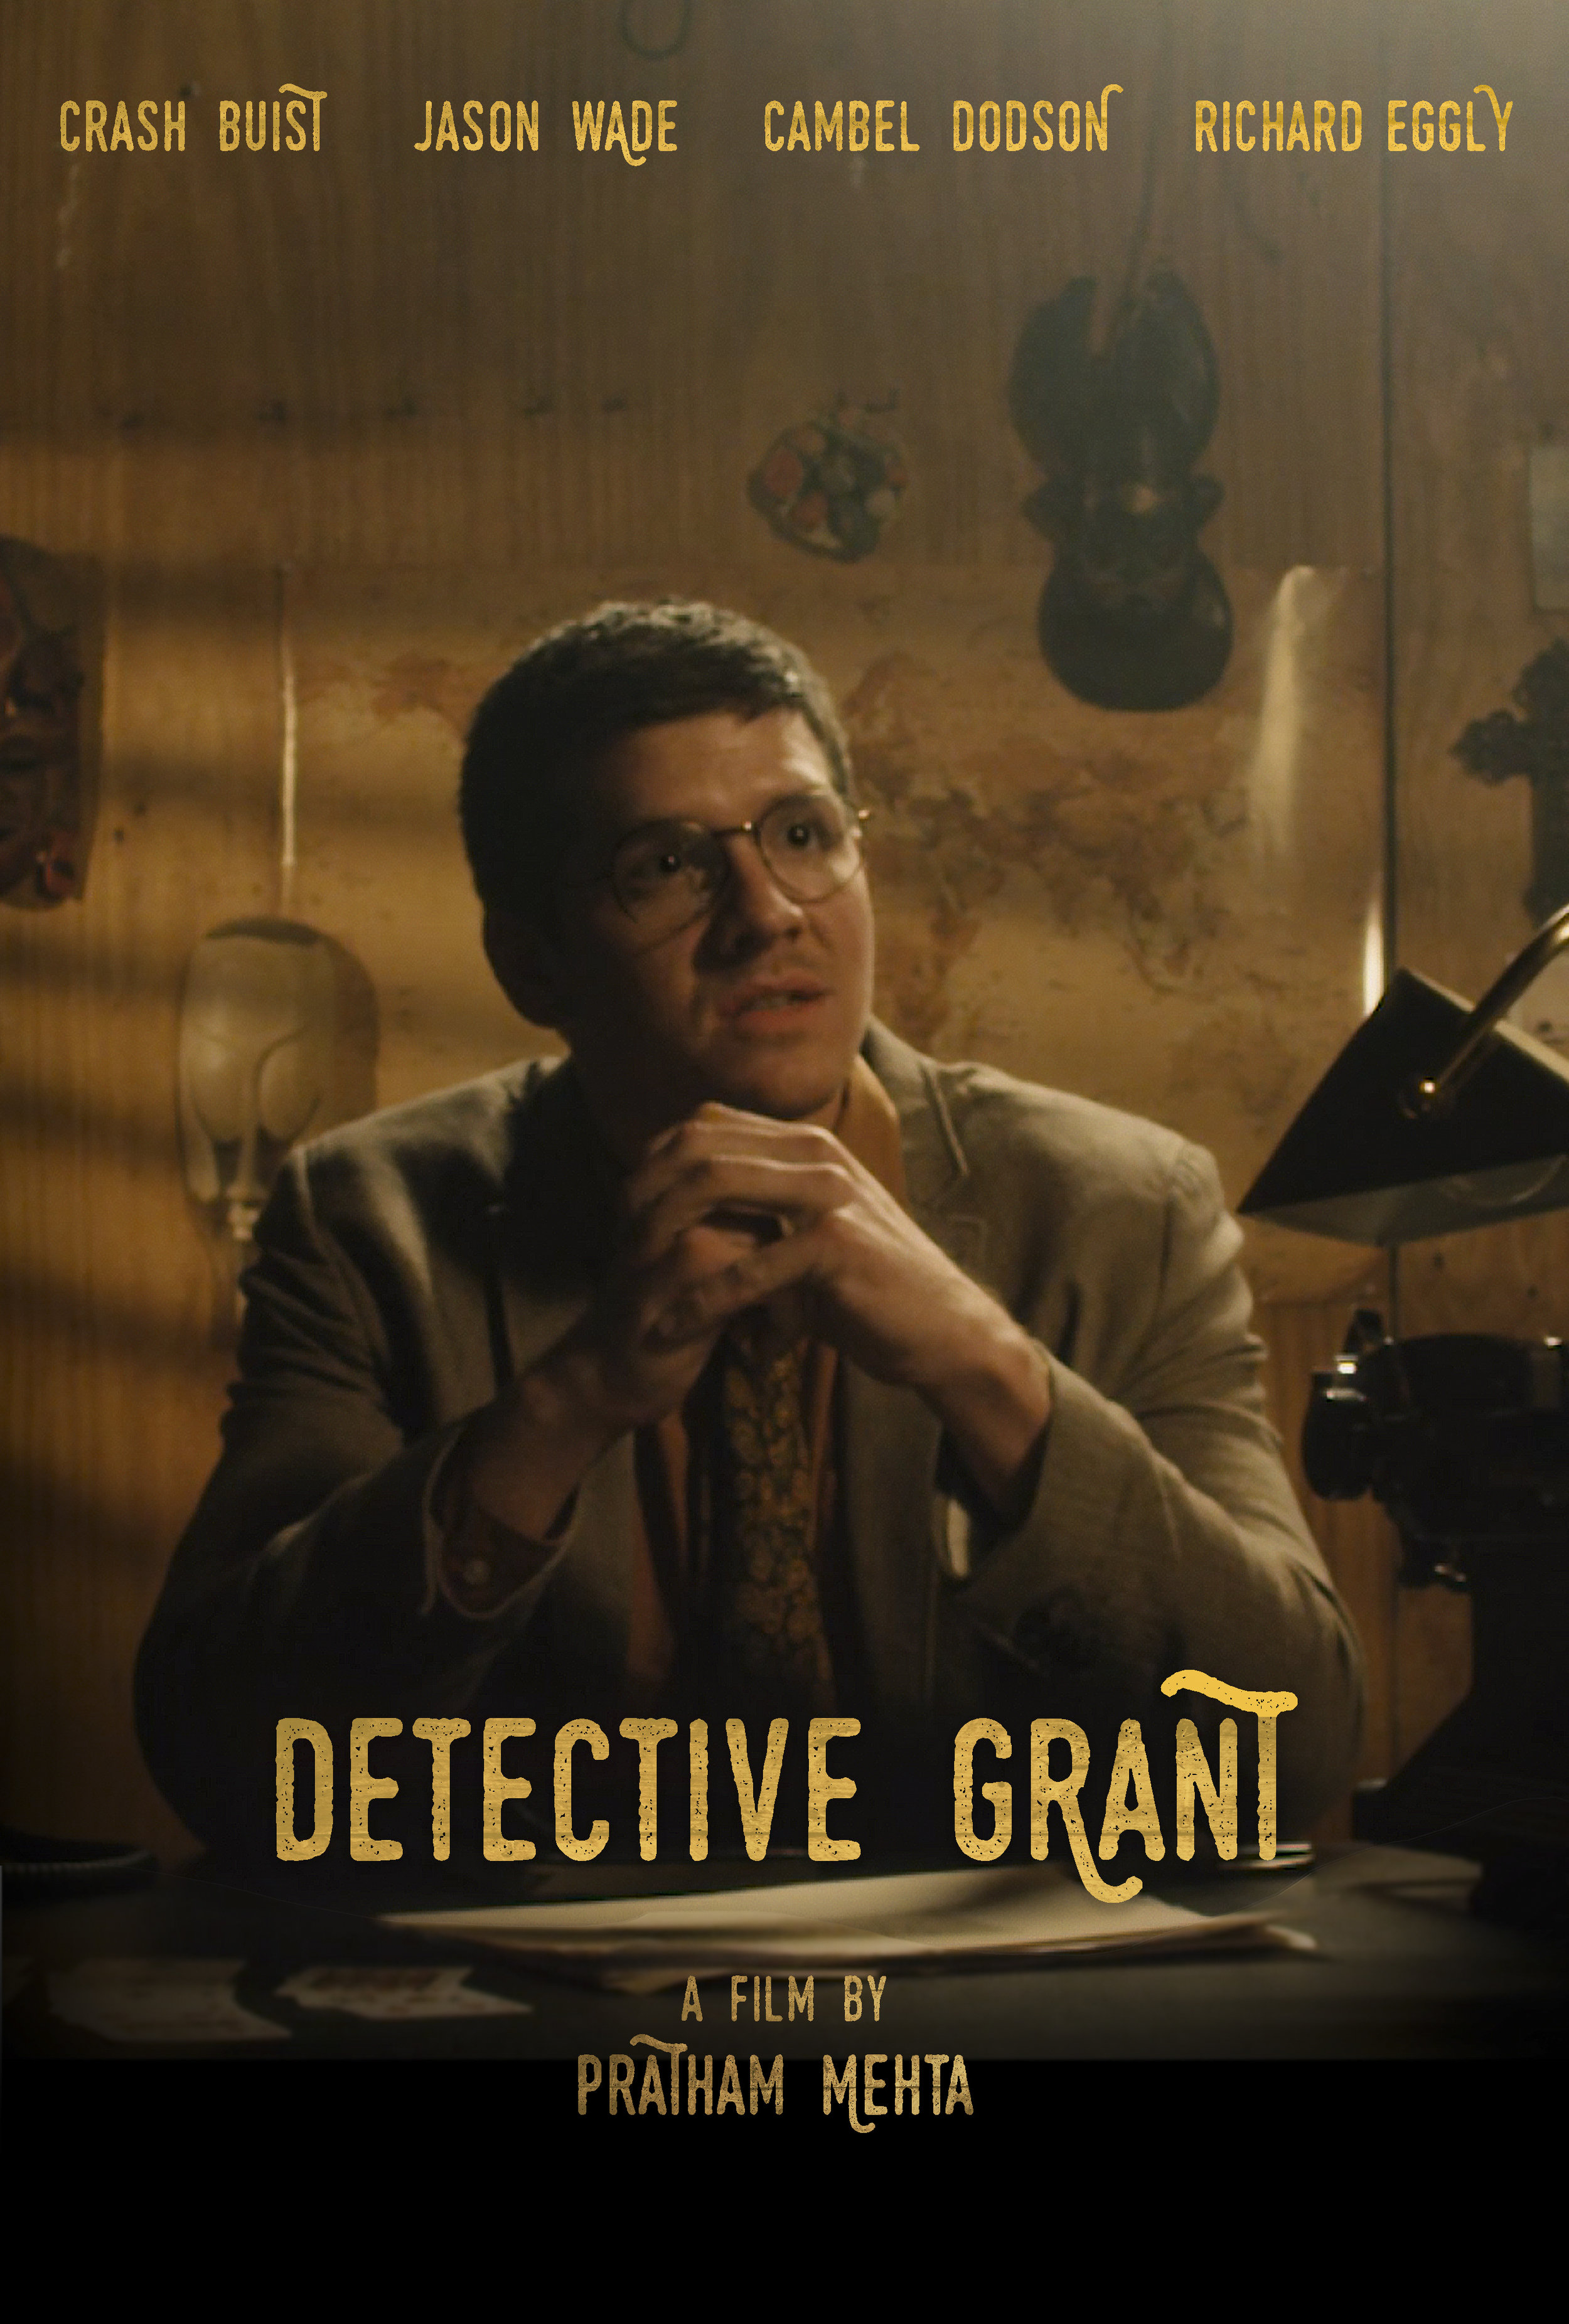 detective grant poster-2.jpg